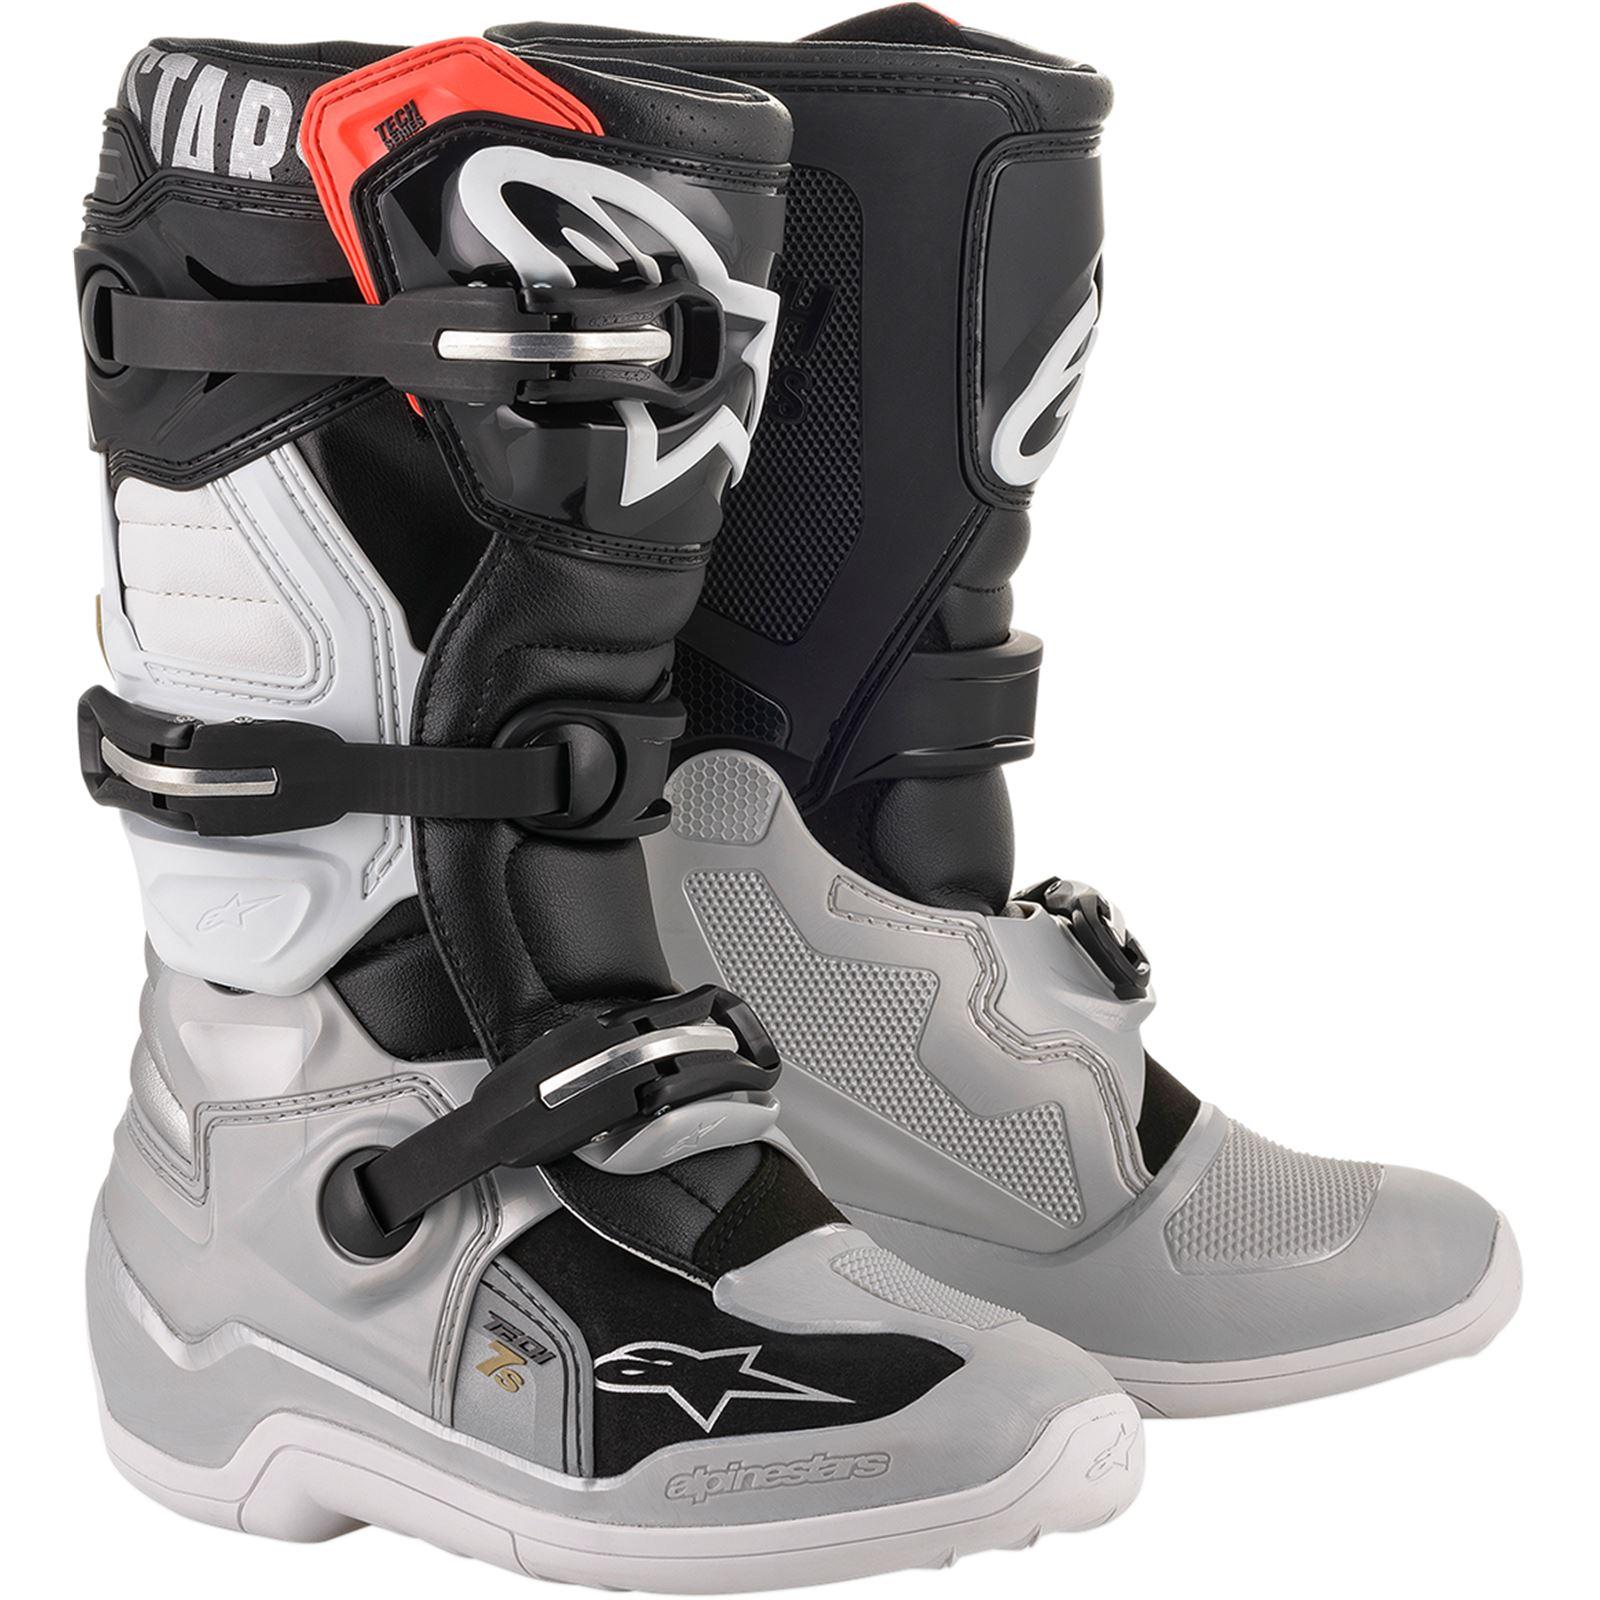 Alpinestars Tech 7S Boot - Black/Silver/White/Gold - Size 7